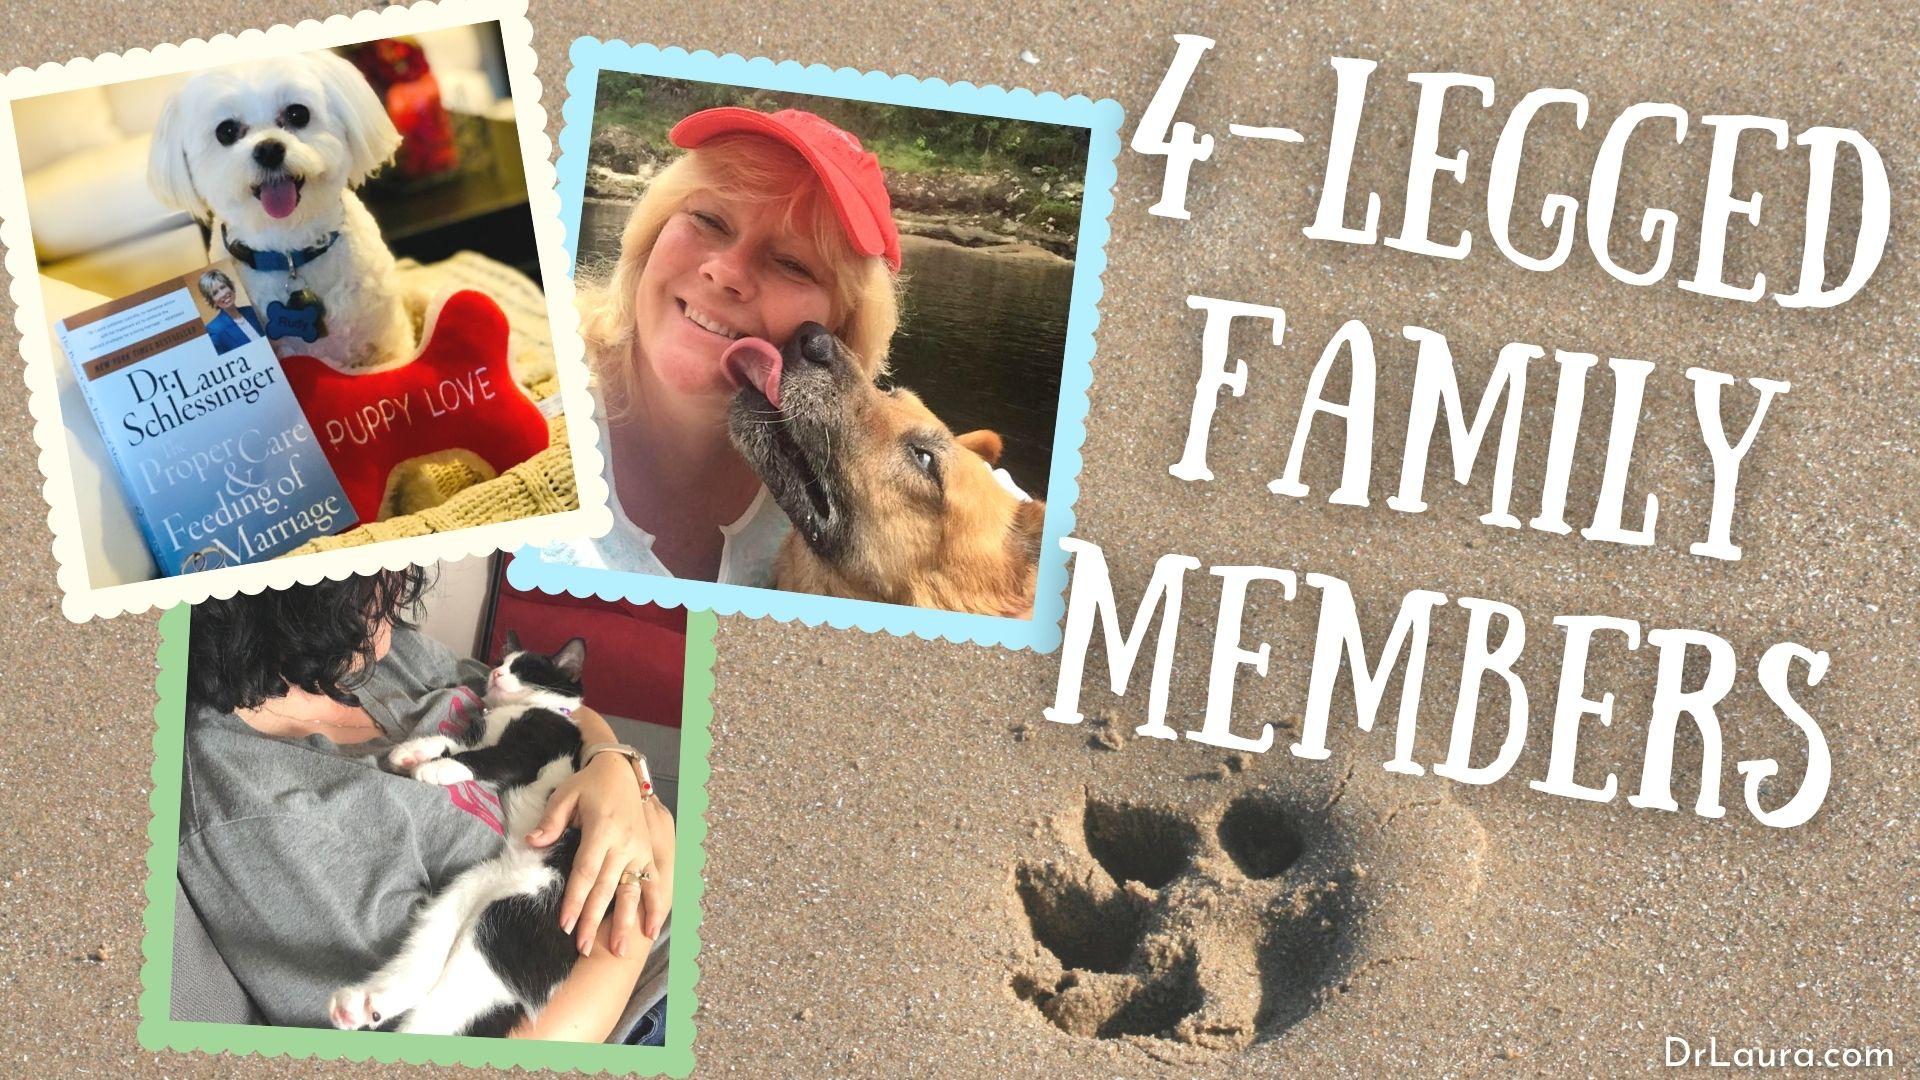 YouTube: 4-Legged Family Members